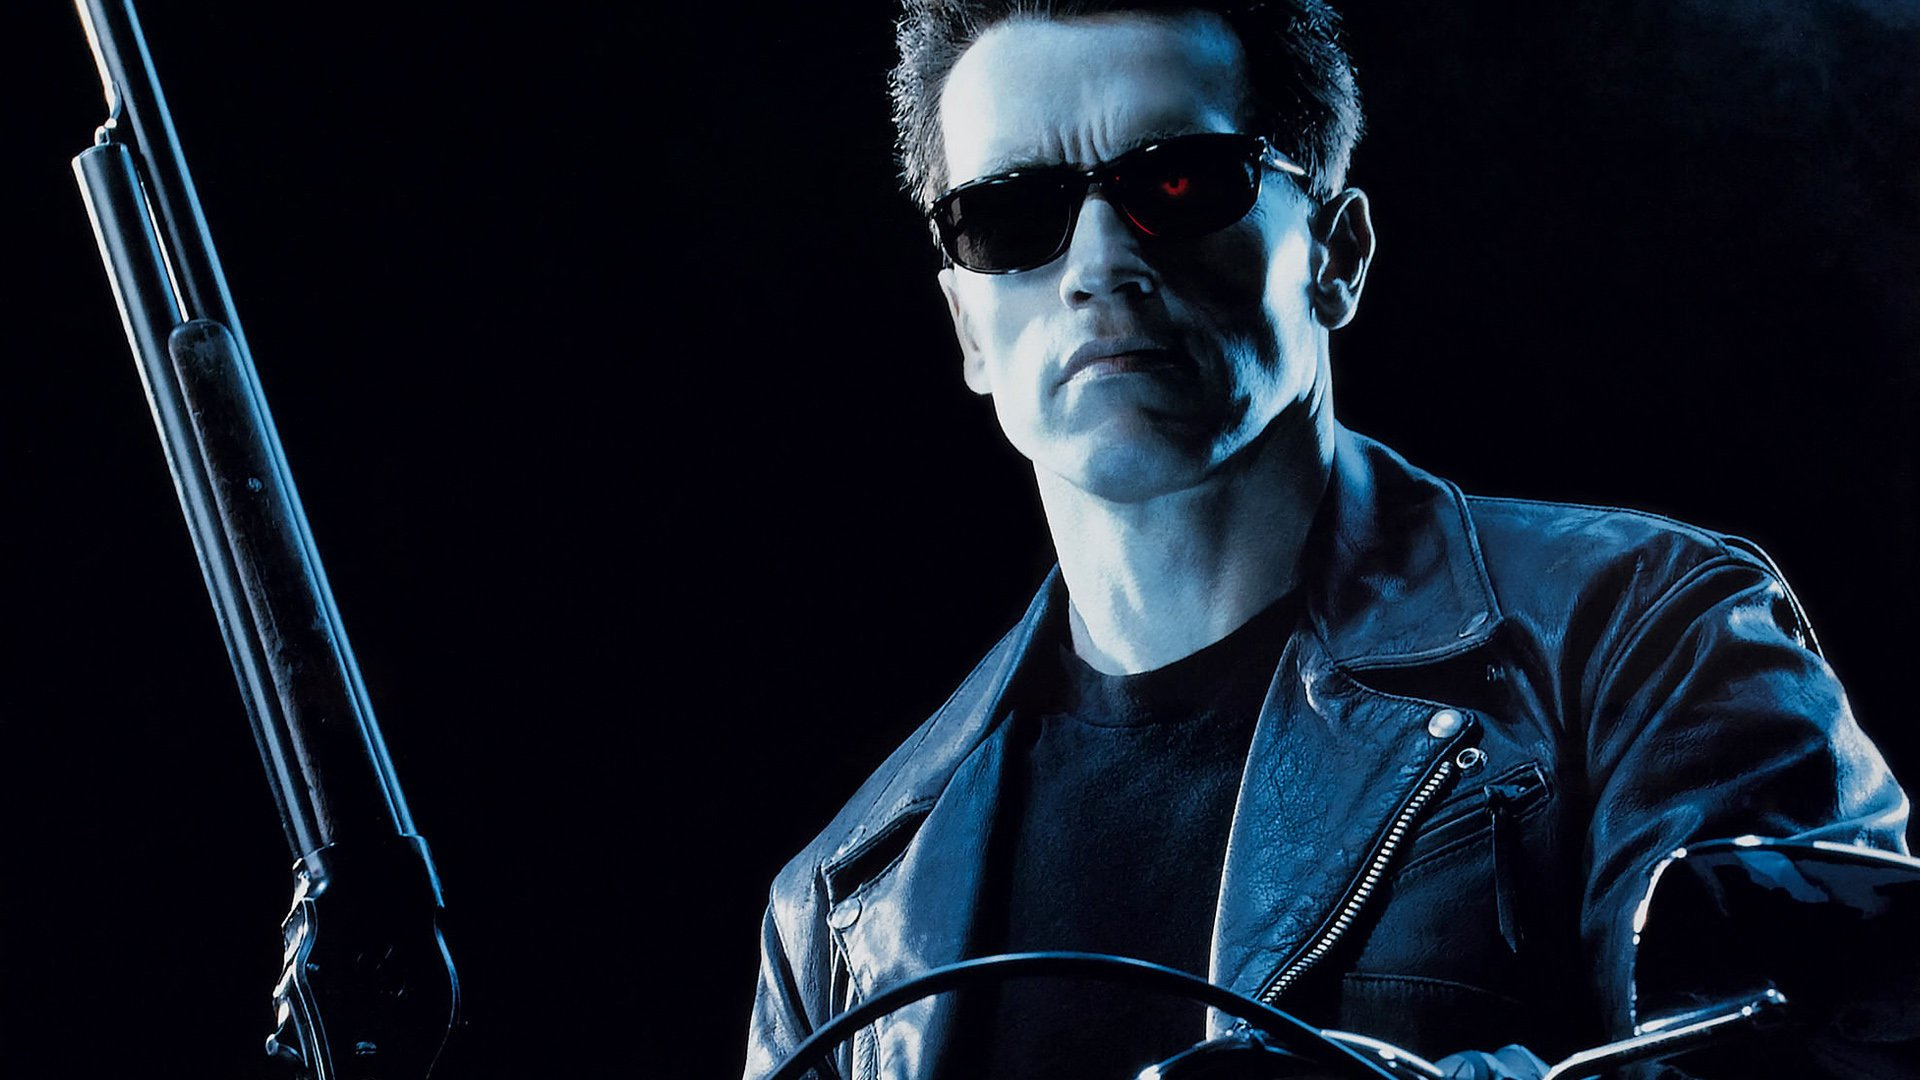 T-800 ( Arnold Schwarzenegger) - Terminator 2 : le jugement dernier